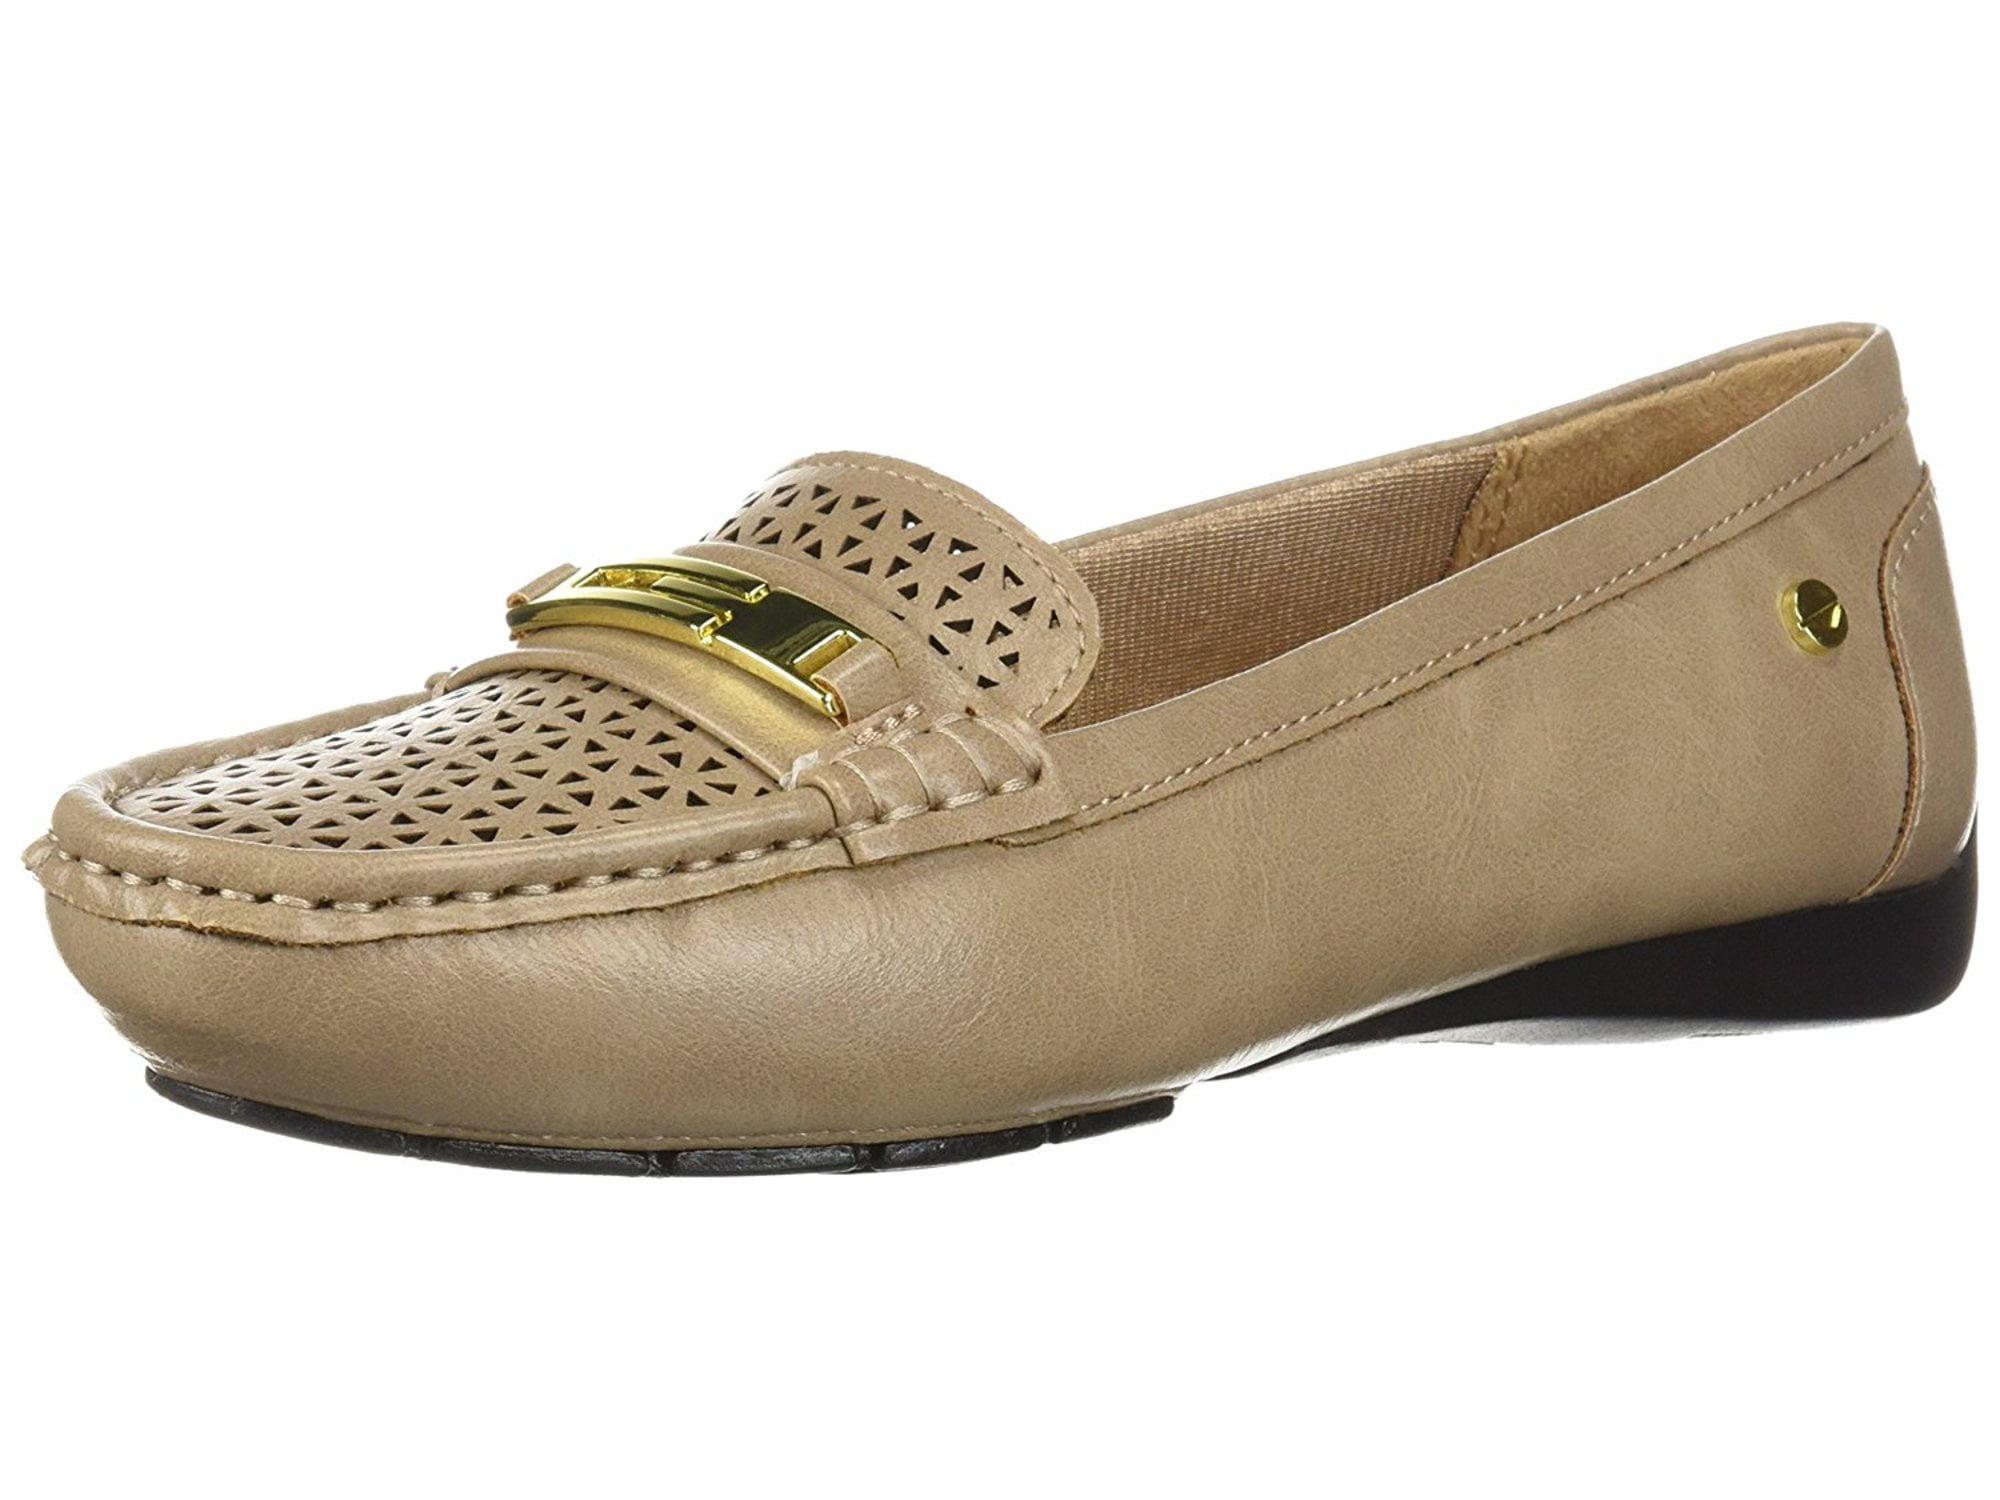 9d6d5ac7eec LifeStride Womens Viva 2 Closed Toe Loafers